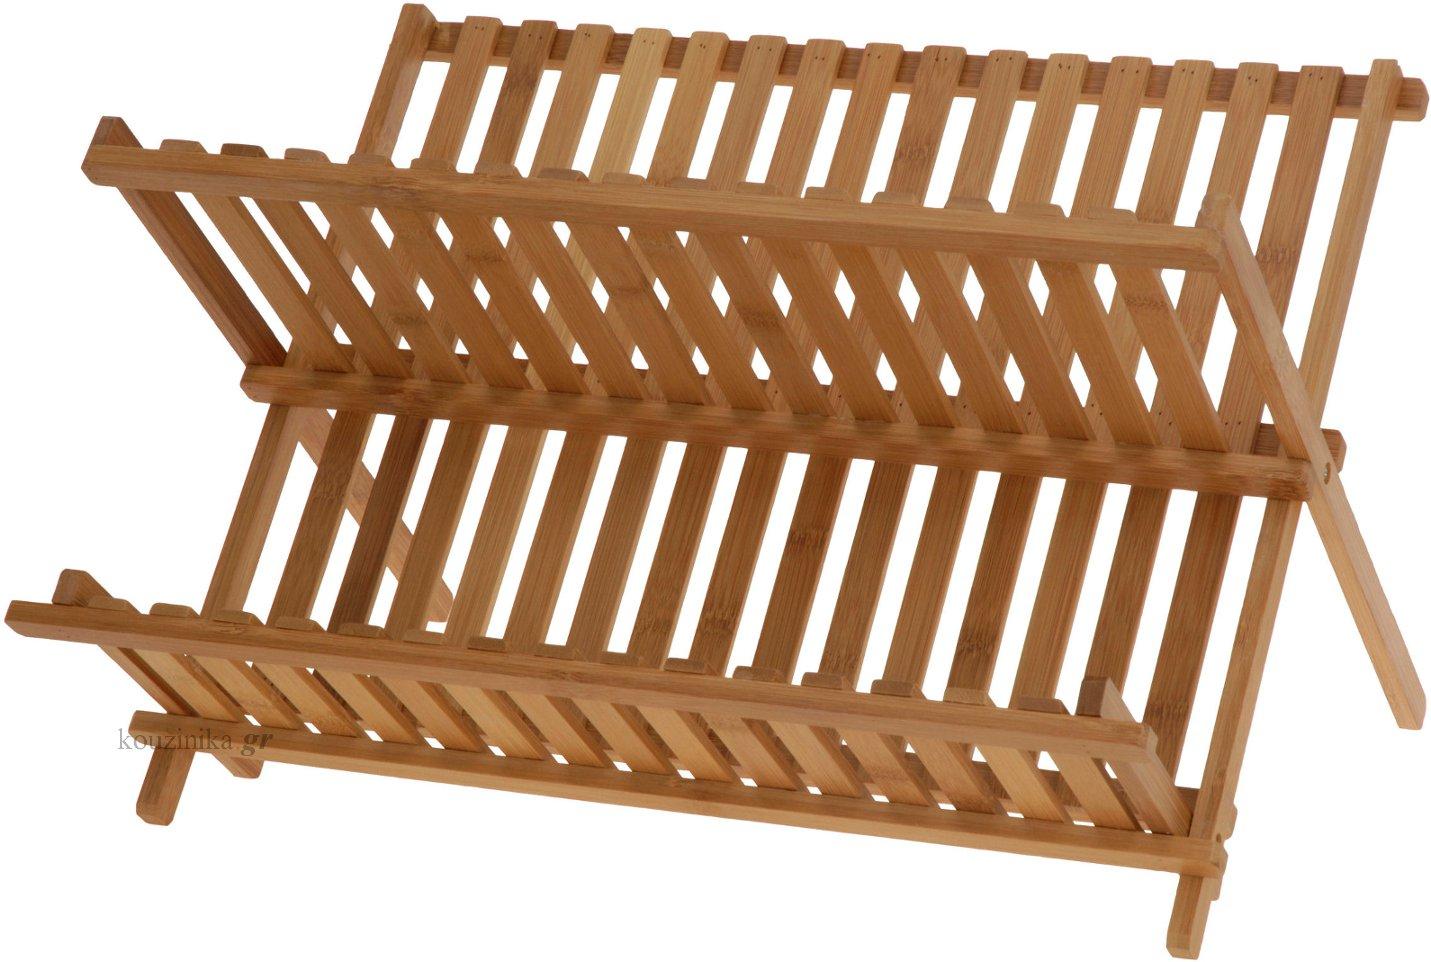 Bamboo πιατοθήκη